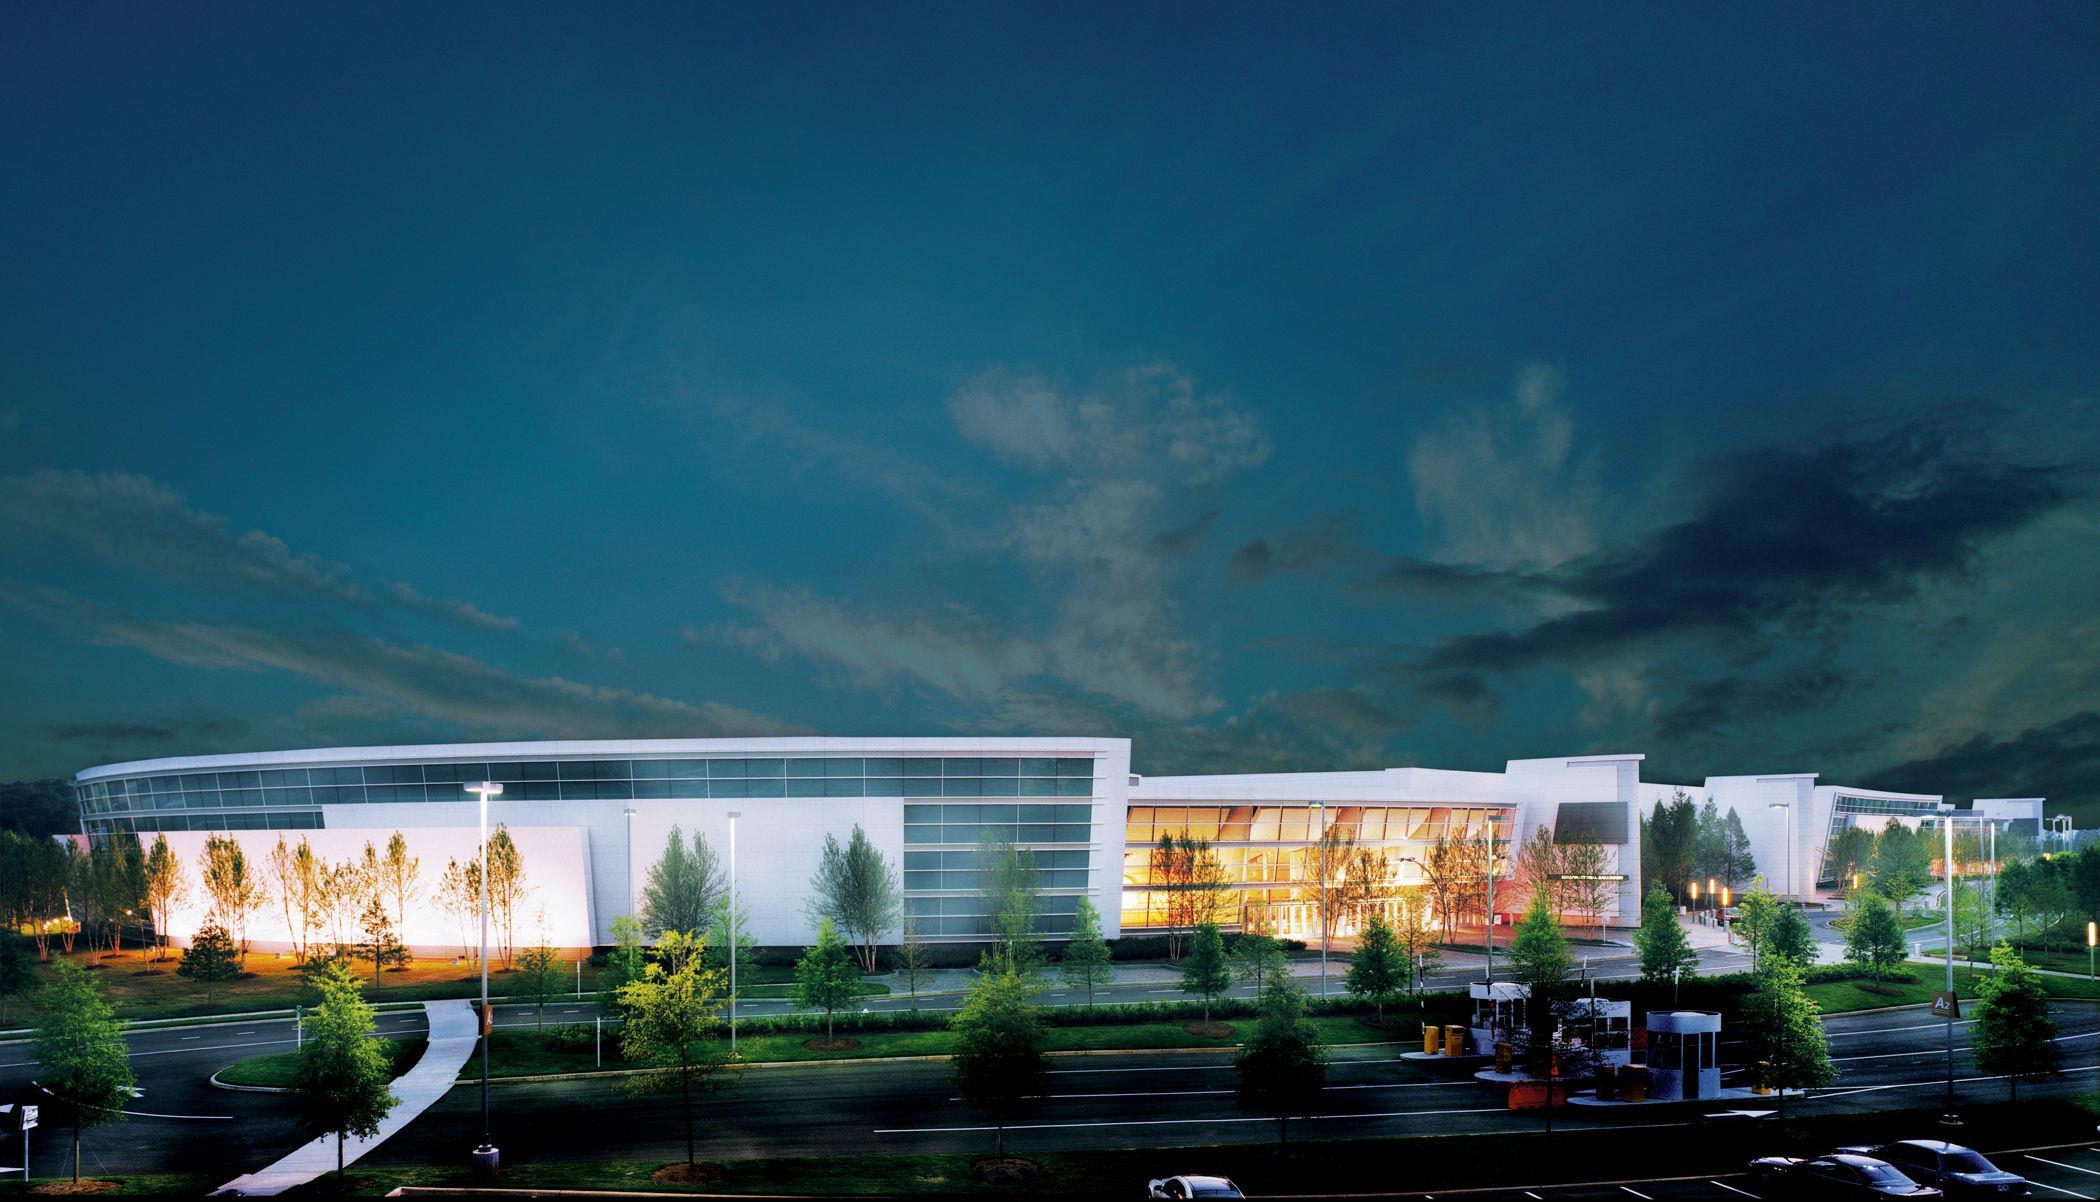 Sheraton Atlanta Airport Hotel image 1